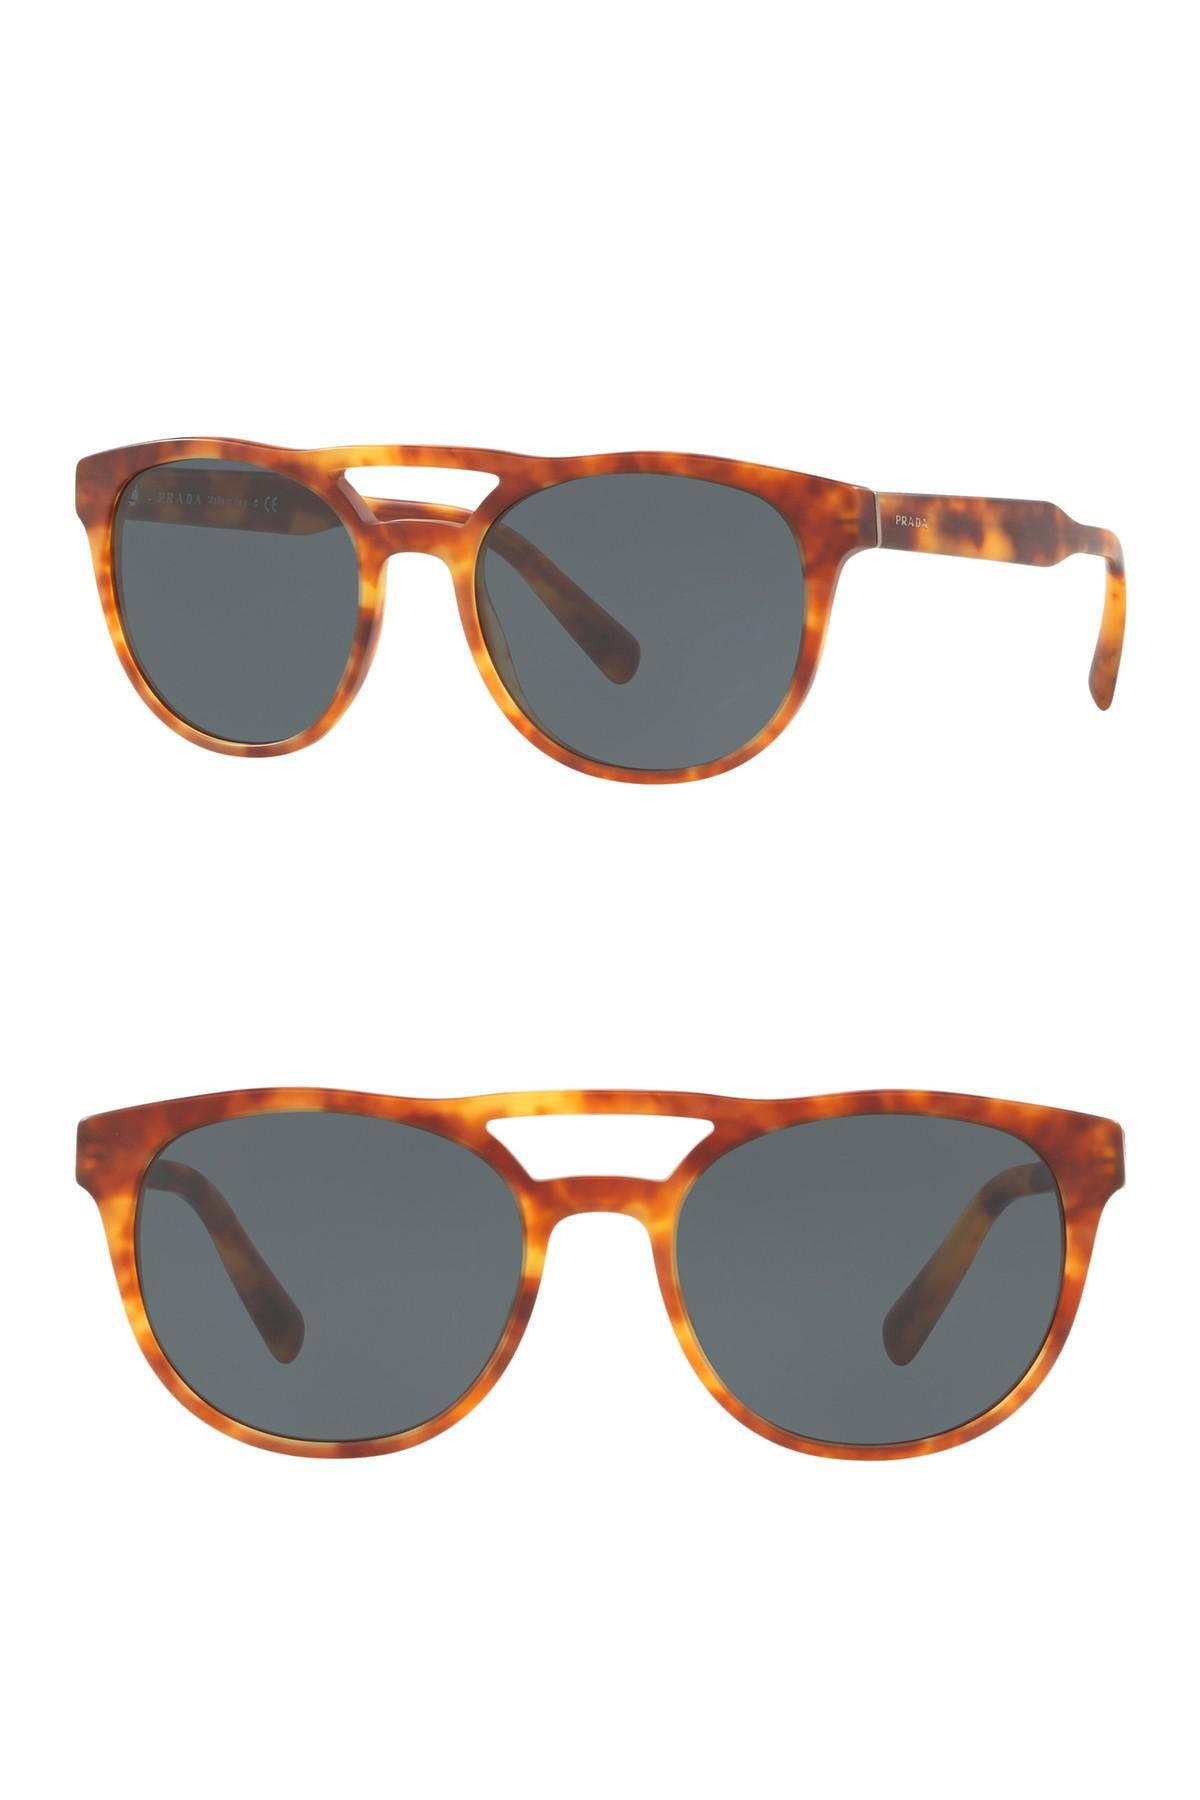 9f37abe008 Prada - Multicolor 54mm Round Aviator Sunglasses for Men - Lyst. View  fullscreen